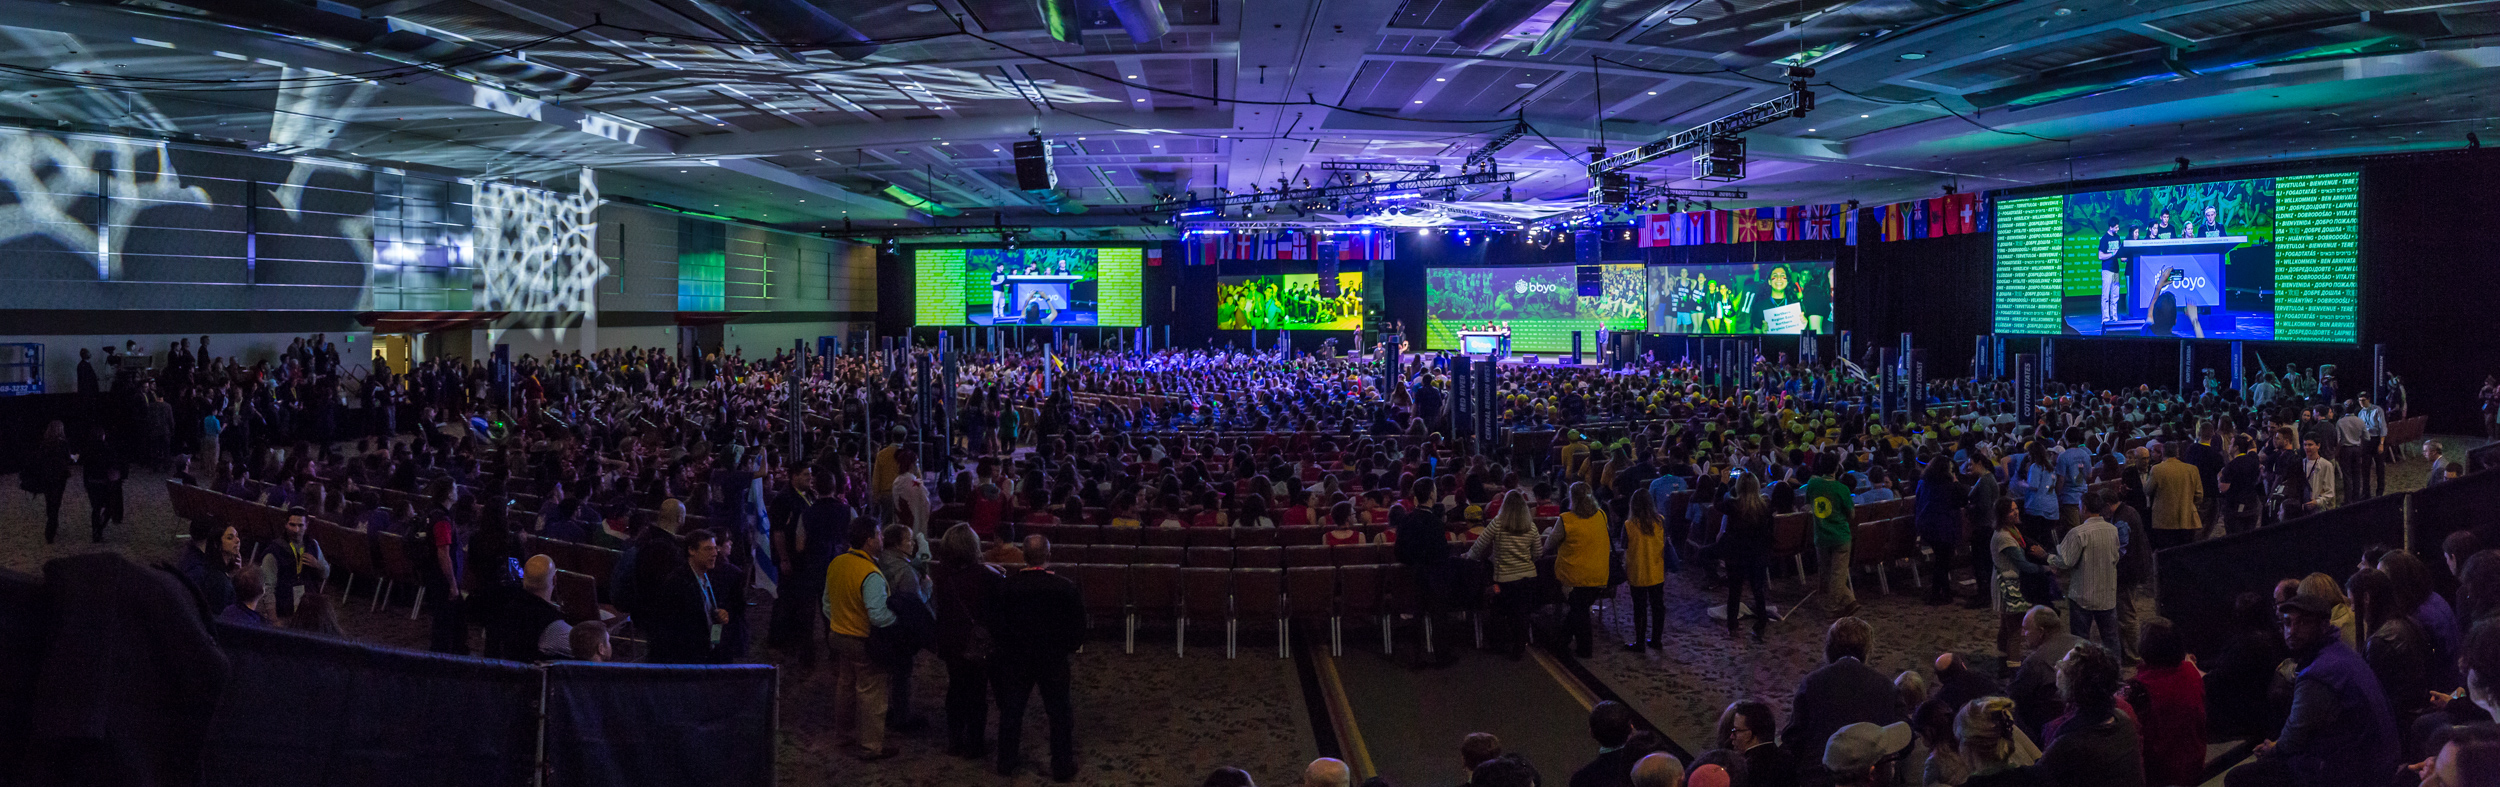 IC 2016 Opening Ceremonies. Photo by Jason Dixson Photography.